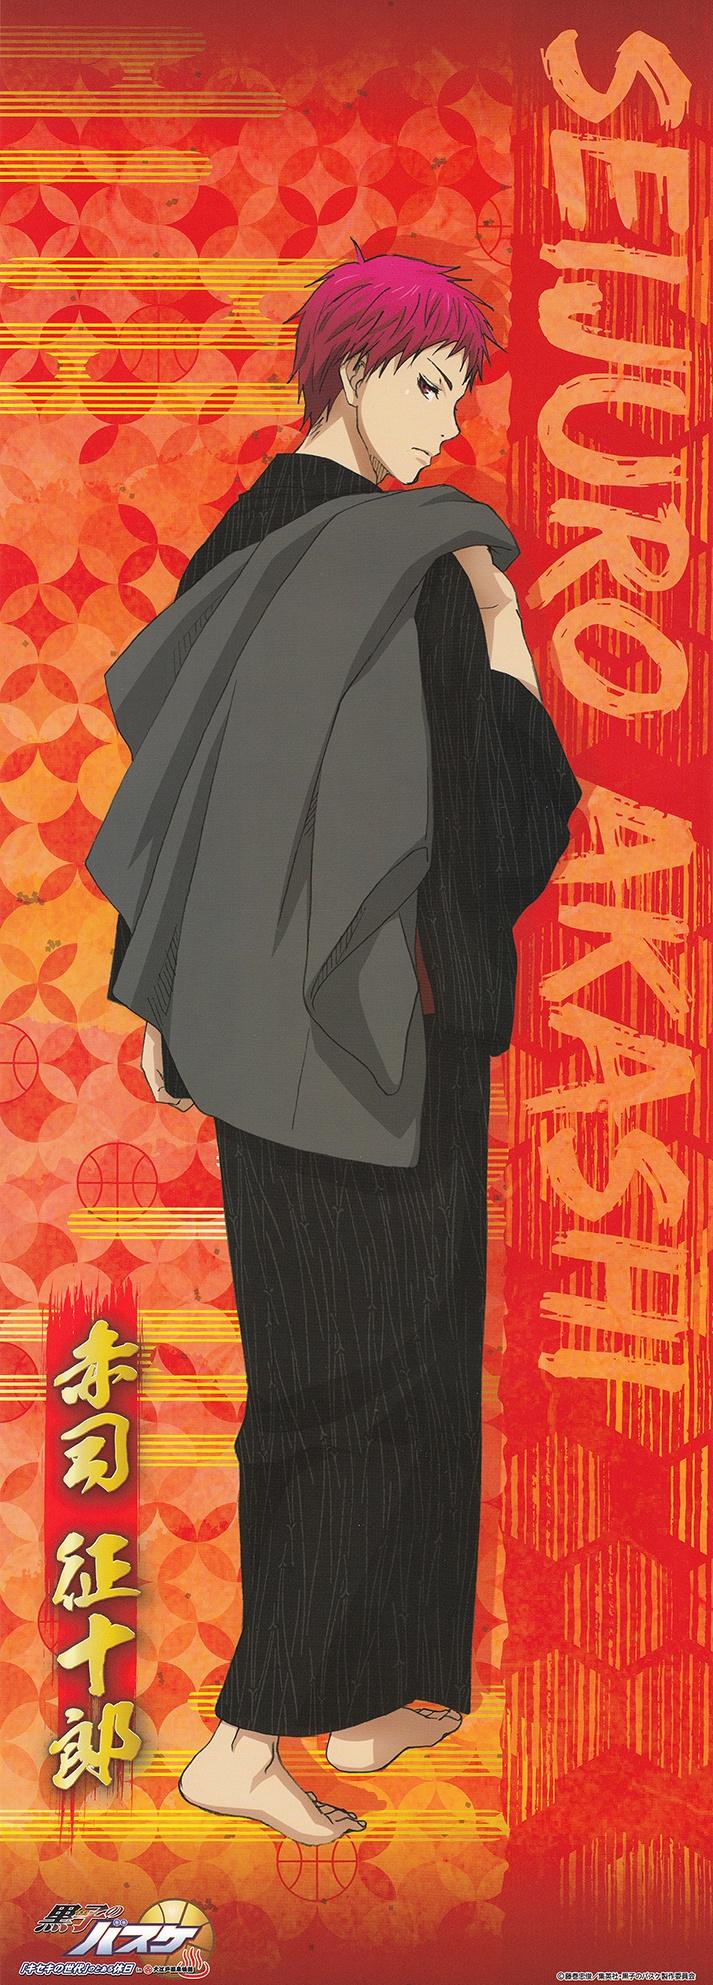 Tags: Official Art, Kuroko no Basuke, Production I.G., Akashi Seijuurou